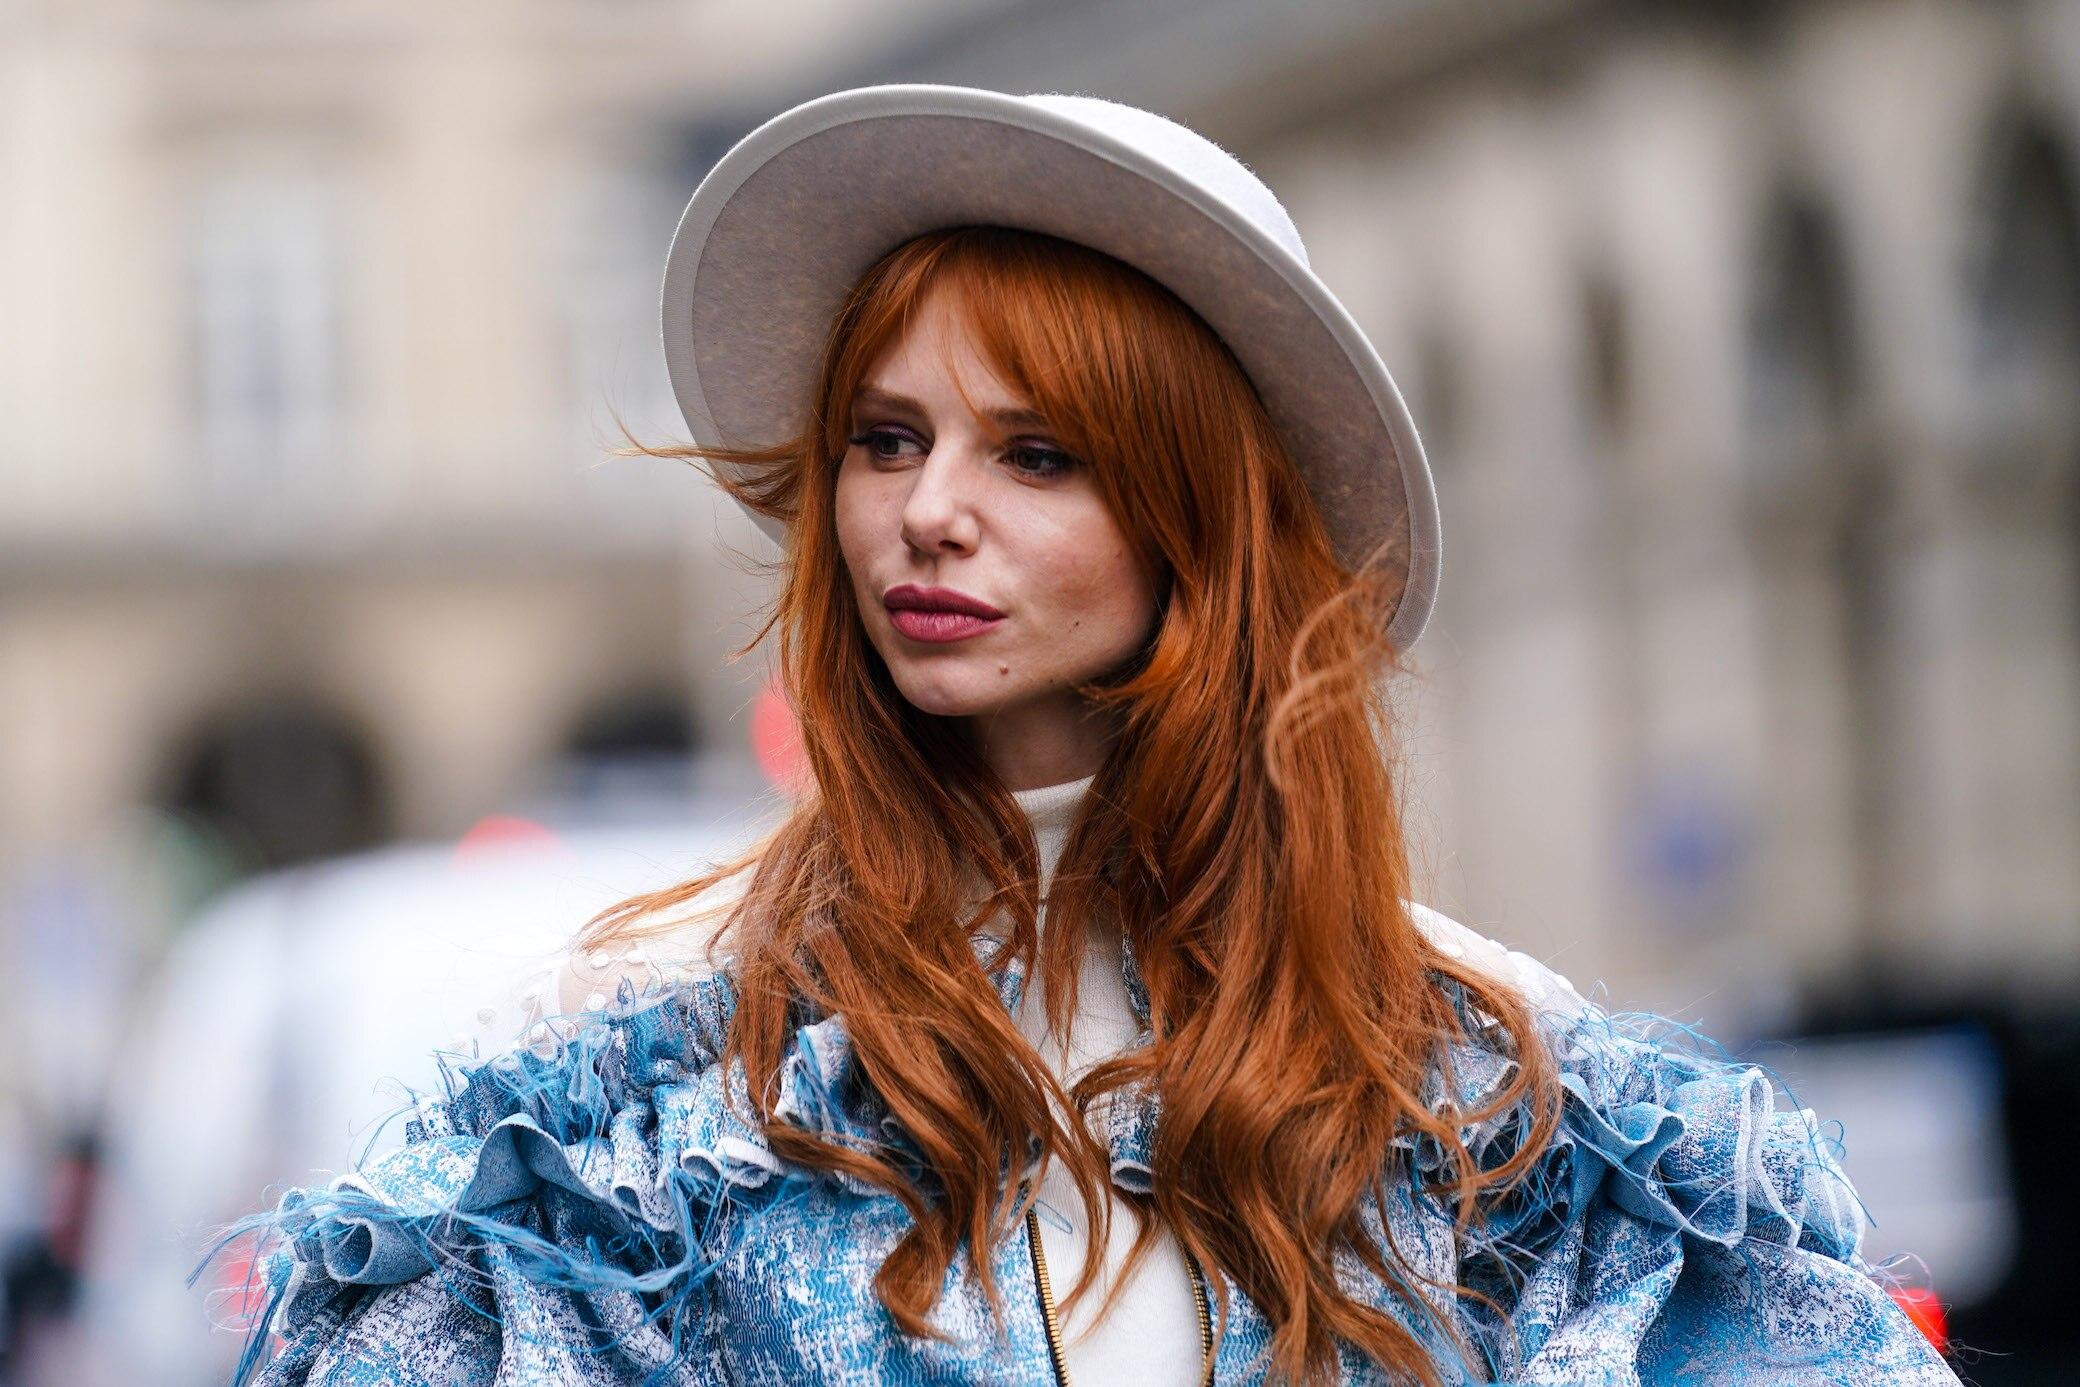 Haare blaue augen färben rote Mutter hat